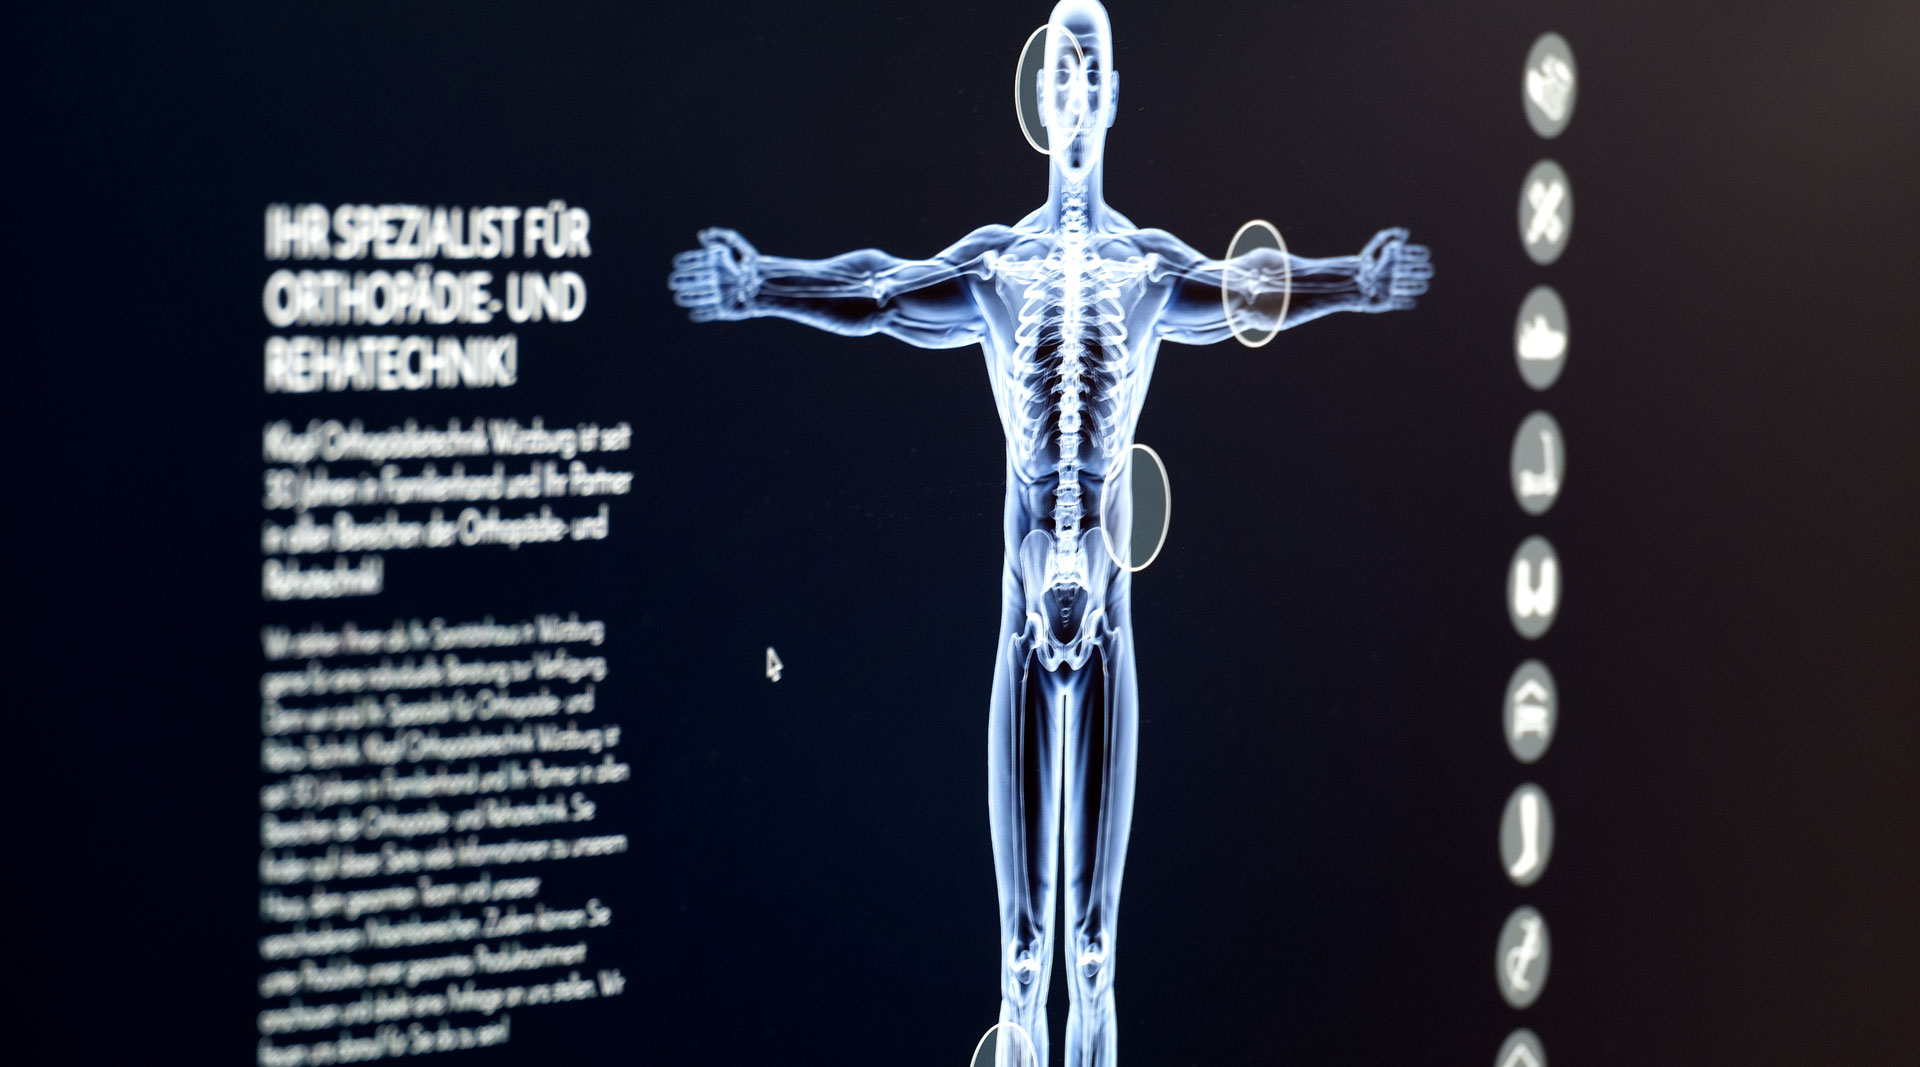 Klopf Orthopädie Würzburg Webdesign jos büro für Gestaltung Screendesign